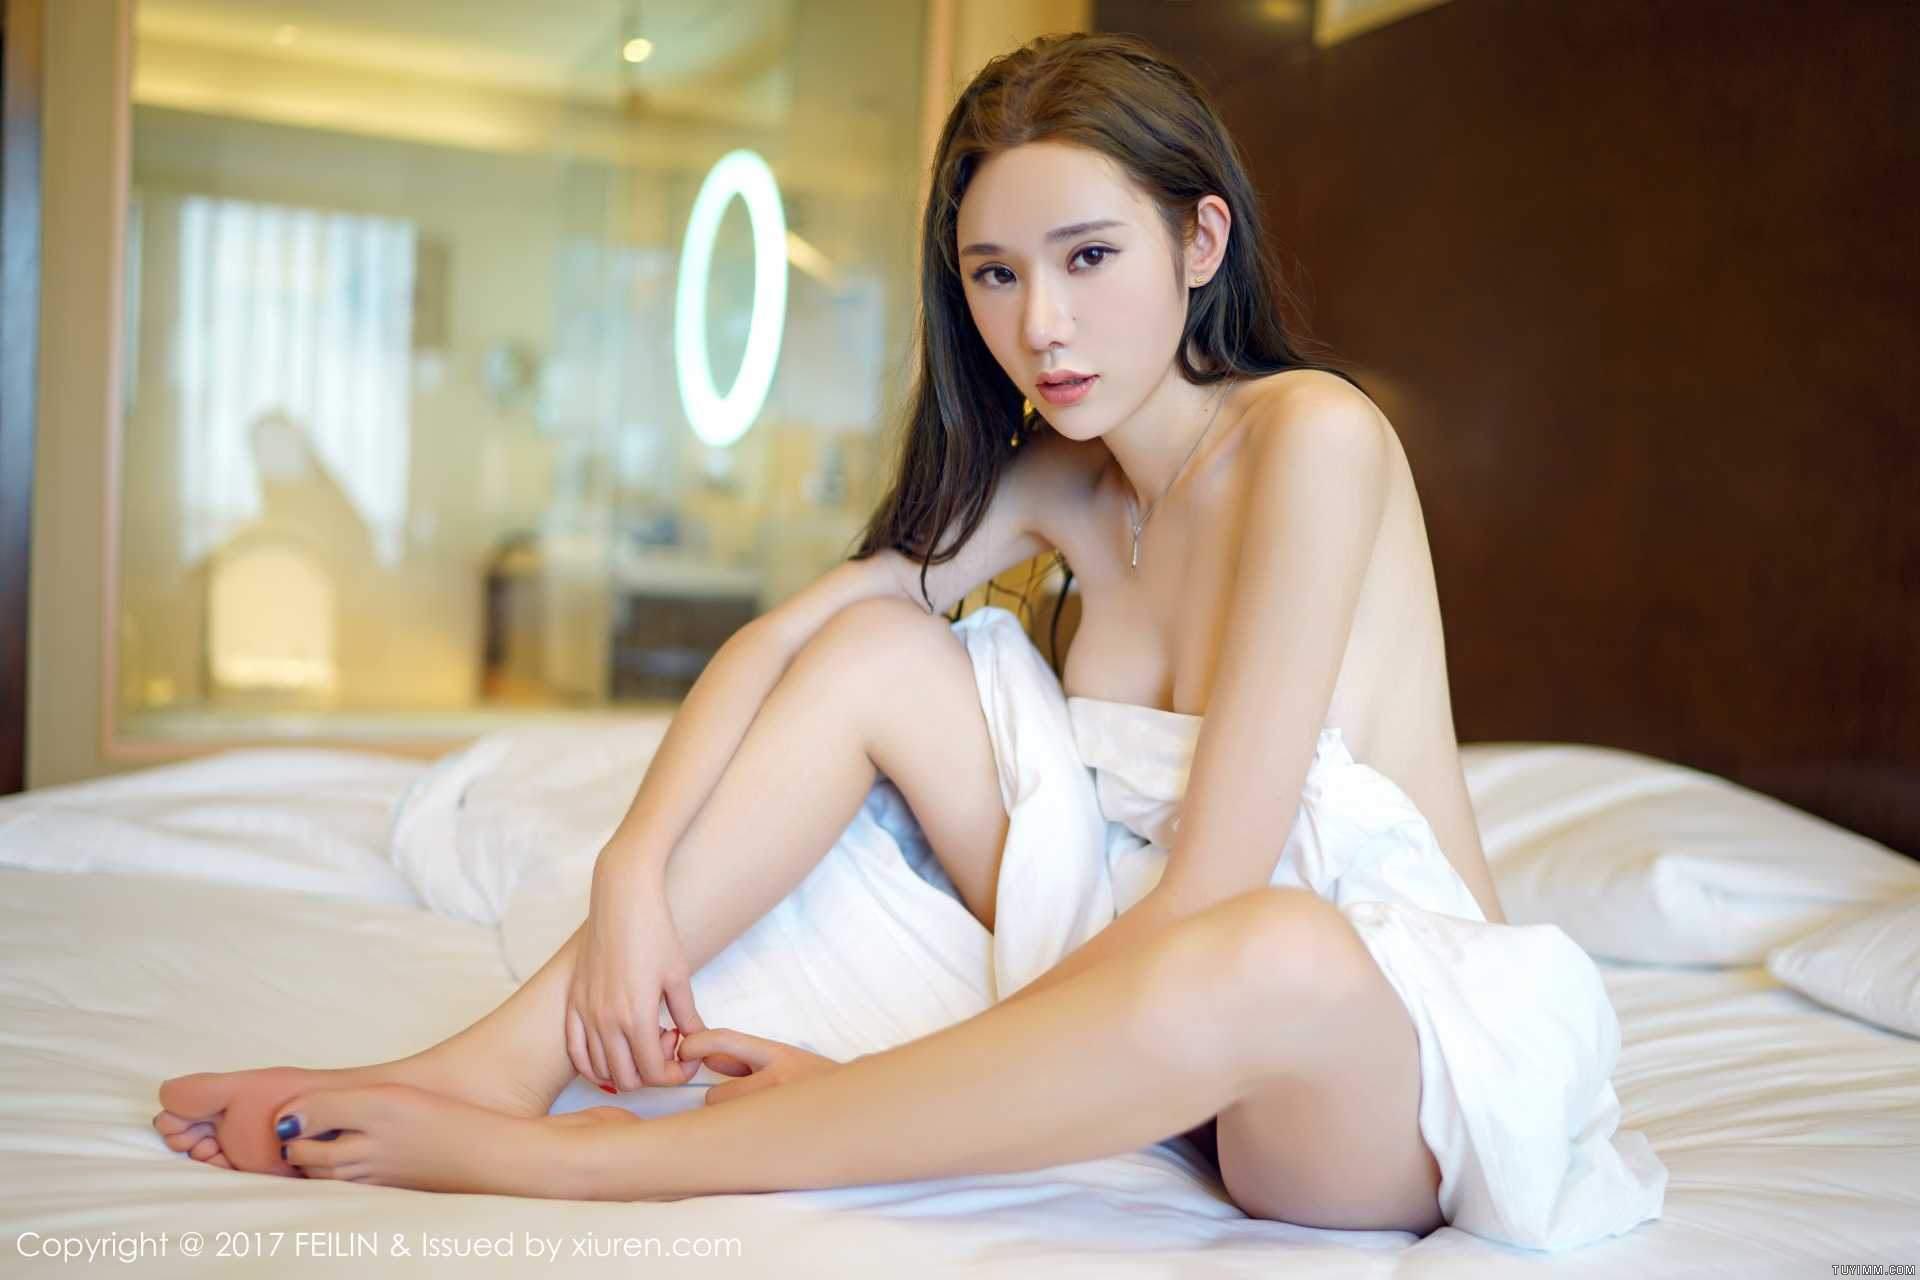 FEILIN嗲囡囡 2017.03.13 VOL.080 萌琪琪Irene-第2张图片-哔哔娱乐网